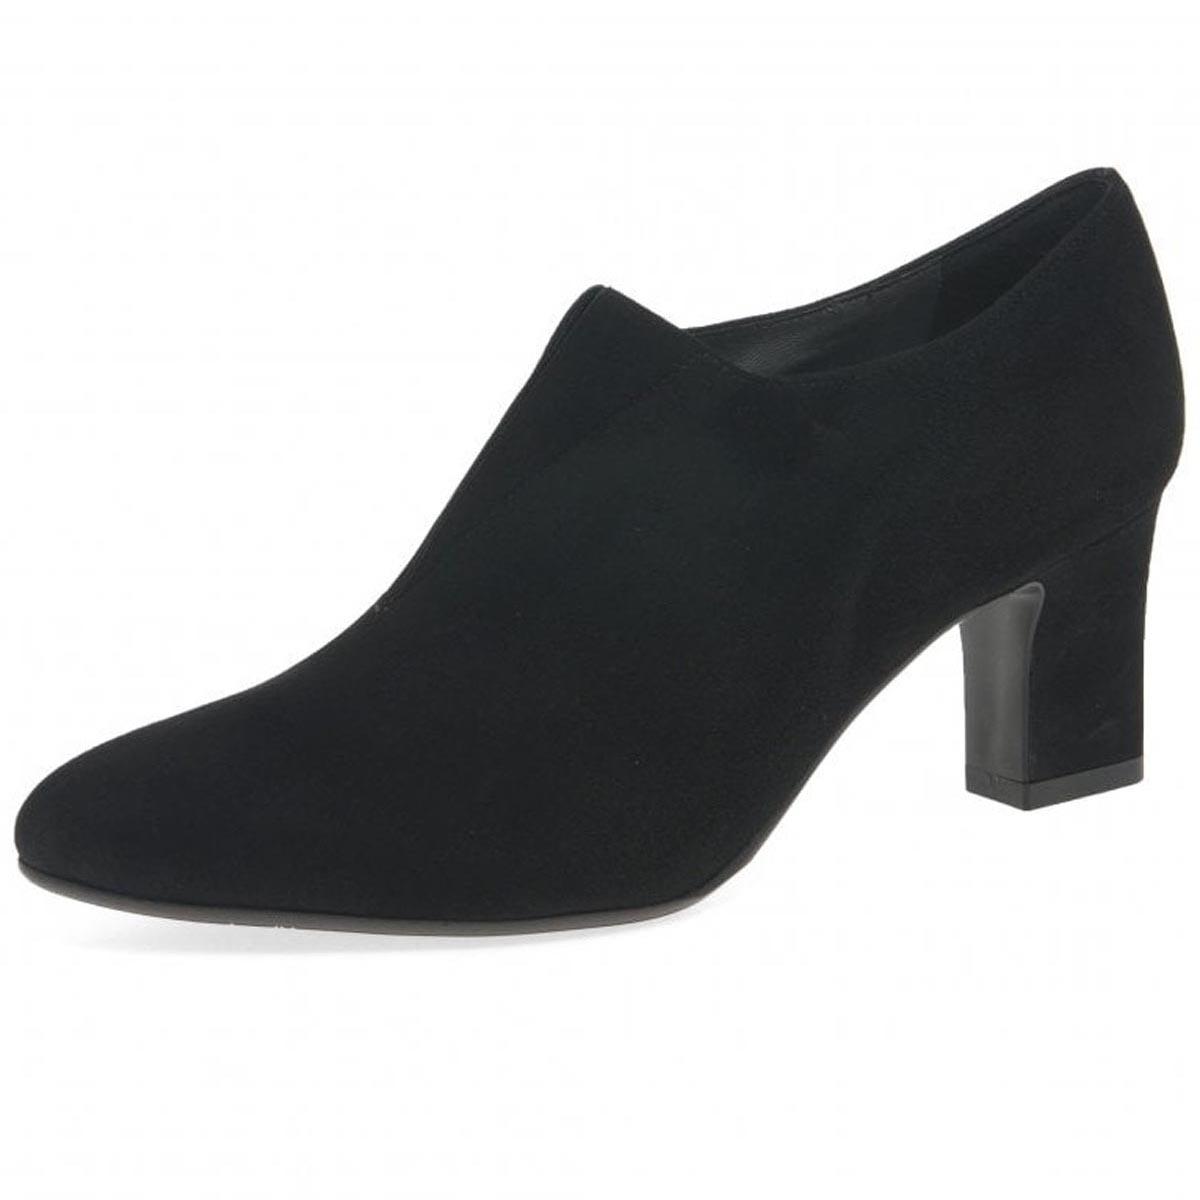 Peter Kaiser - Miaka Black Suede Shoe Boot